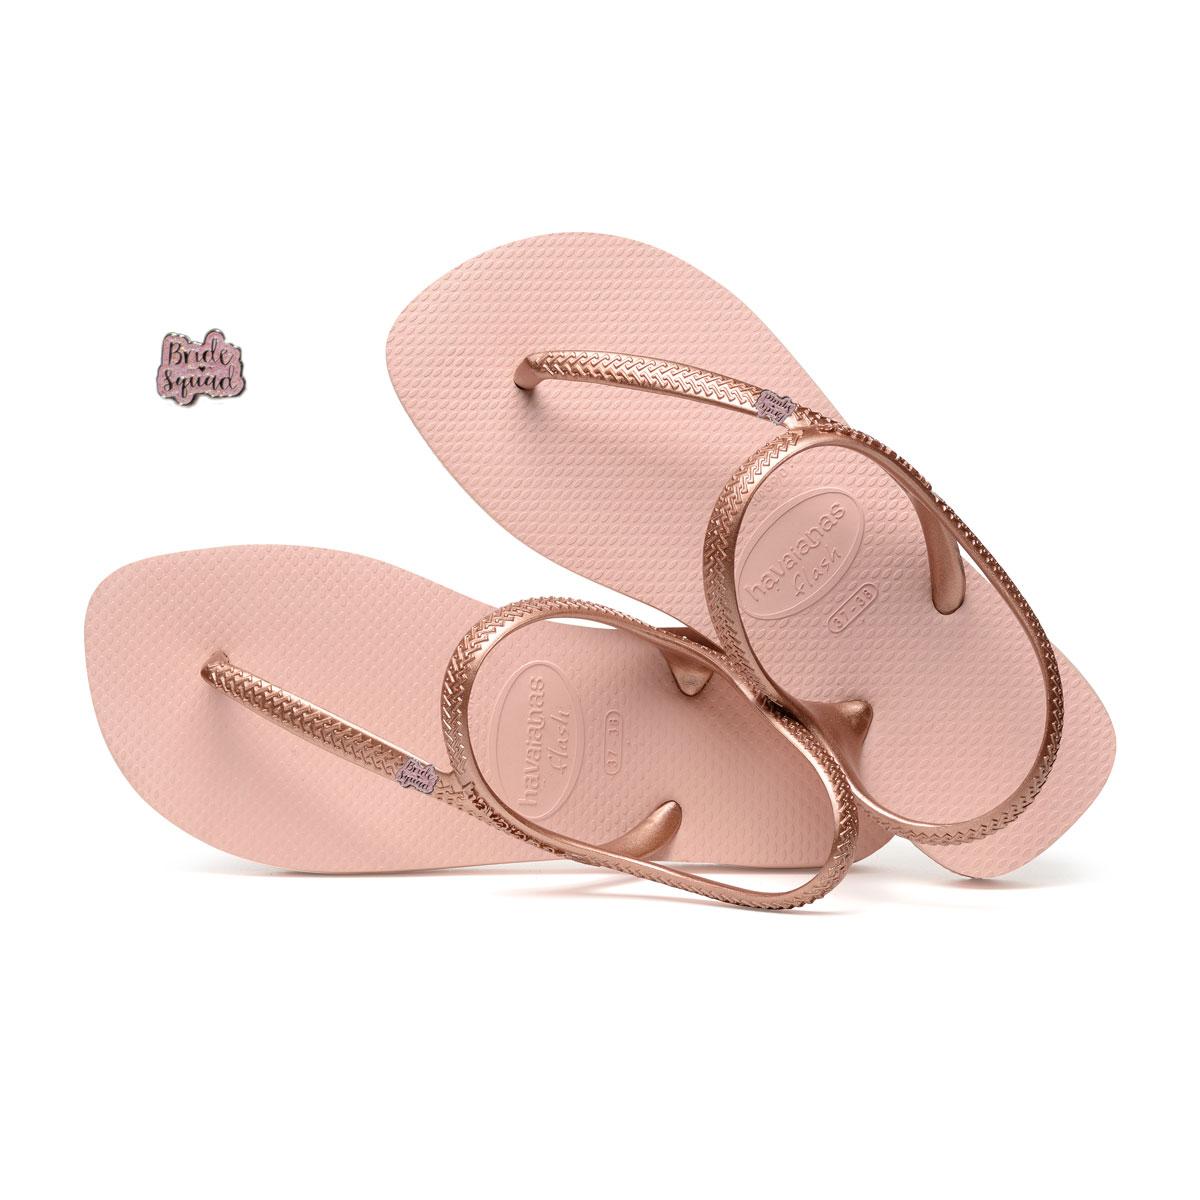 Bride Squad Pink Glitter Pin Havaianas Ballet Rose Flip Flops Wedding